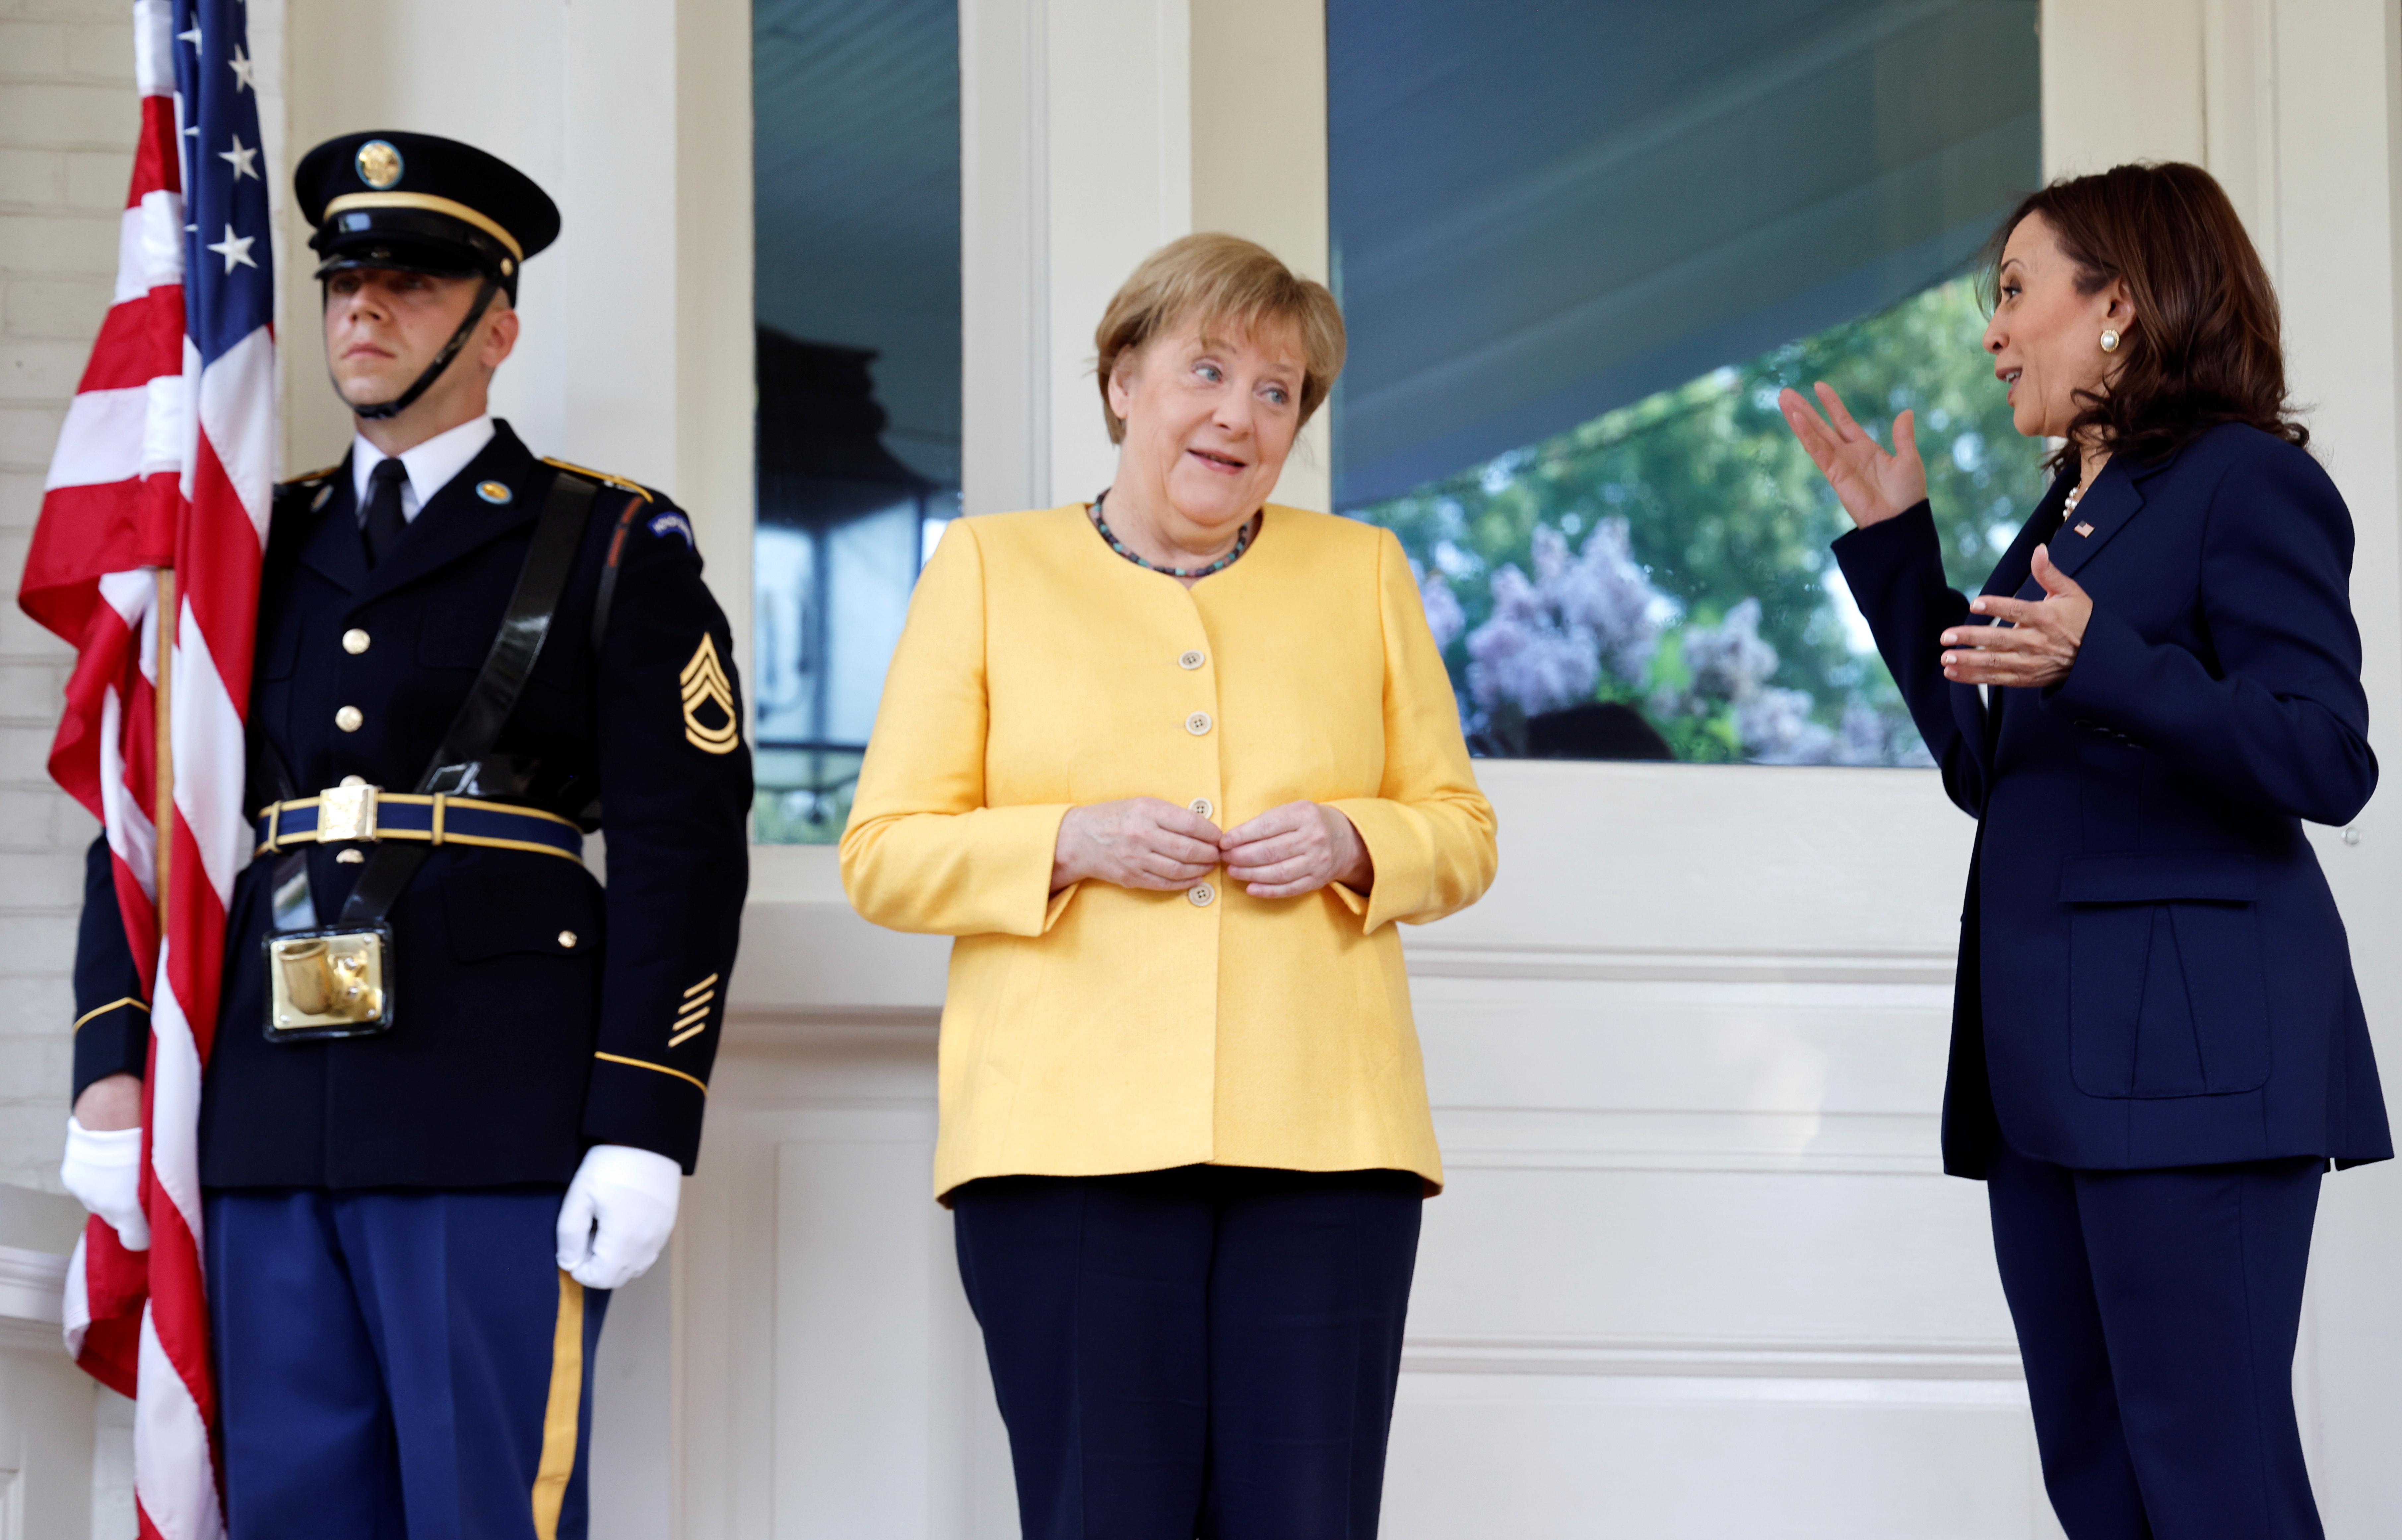 U.S. Vice President Kamala Harris meets with German Chancellor Angela Merkel at the U.S. Naval Observatory, Vice President's residence, in Washington, July 15, 2021. REUTERS/Jonathan Ernst